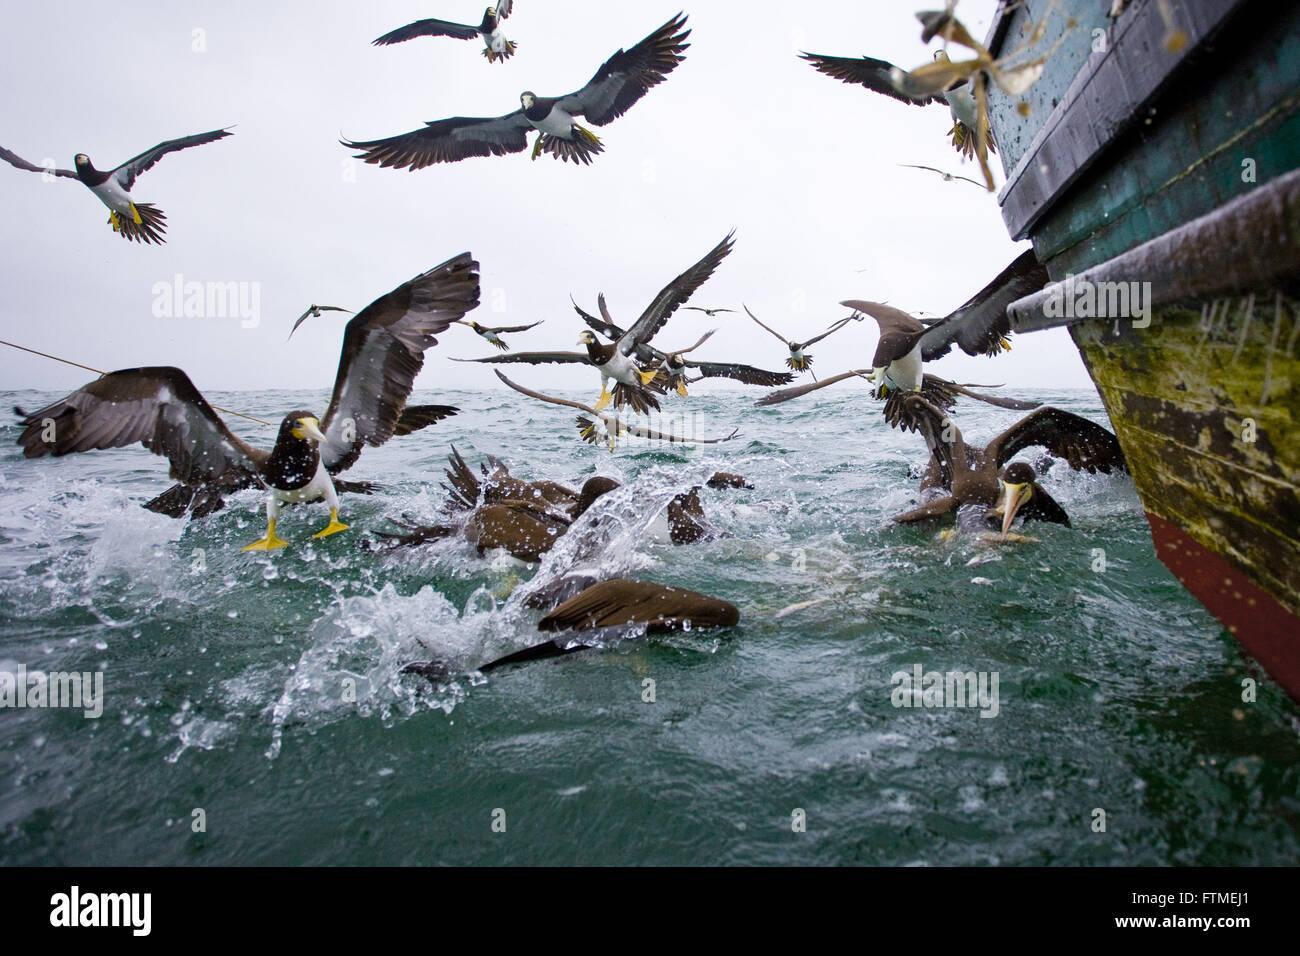 Birds feeding on scraps from trawling the coast of Santa Catarina - Stock Image